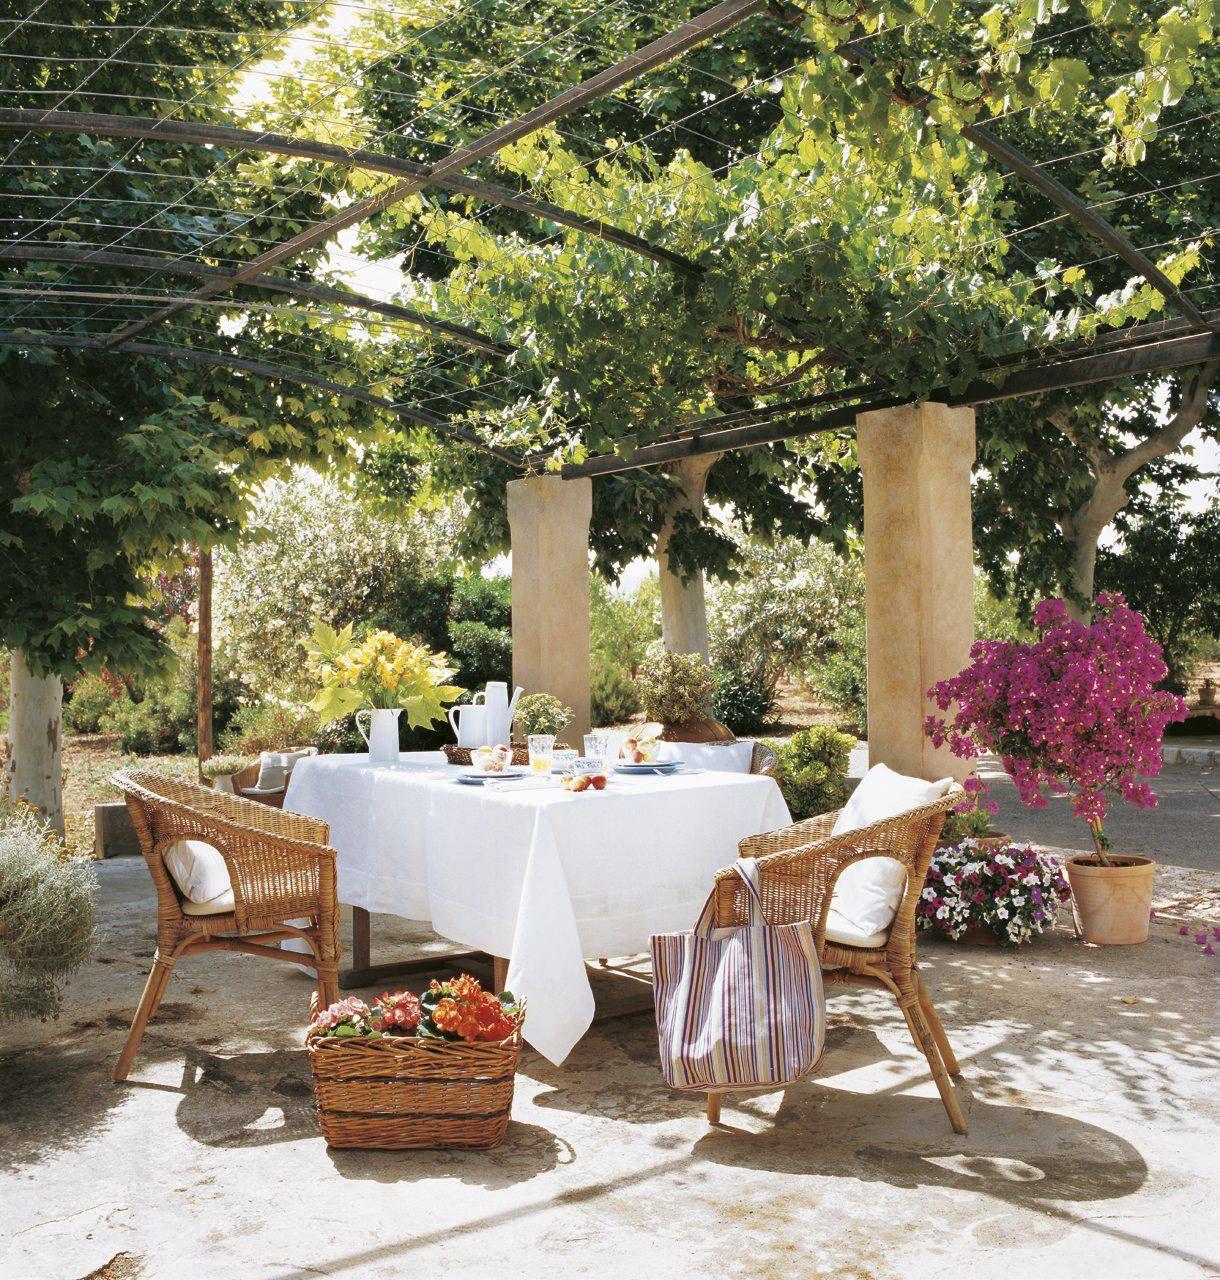 Por Que Anadir Una Pergola A Tu Jardin Sala De Exterior Jardines Bonitos Comedor Al Aire Libre